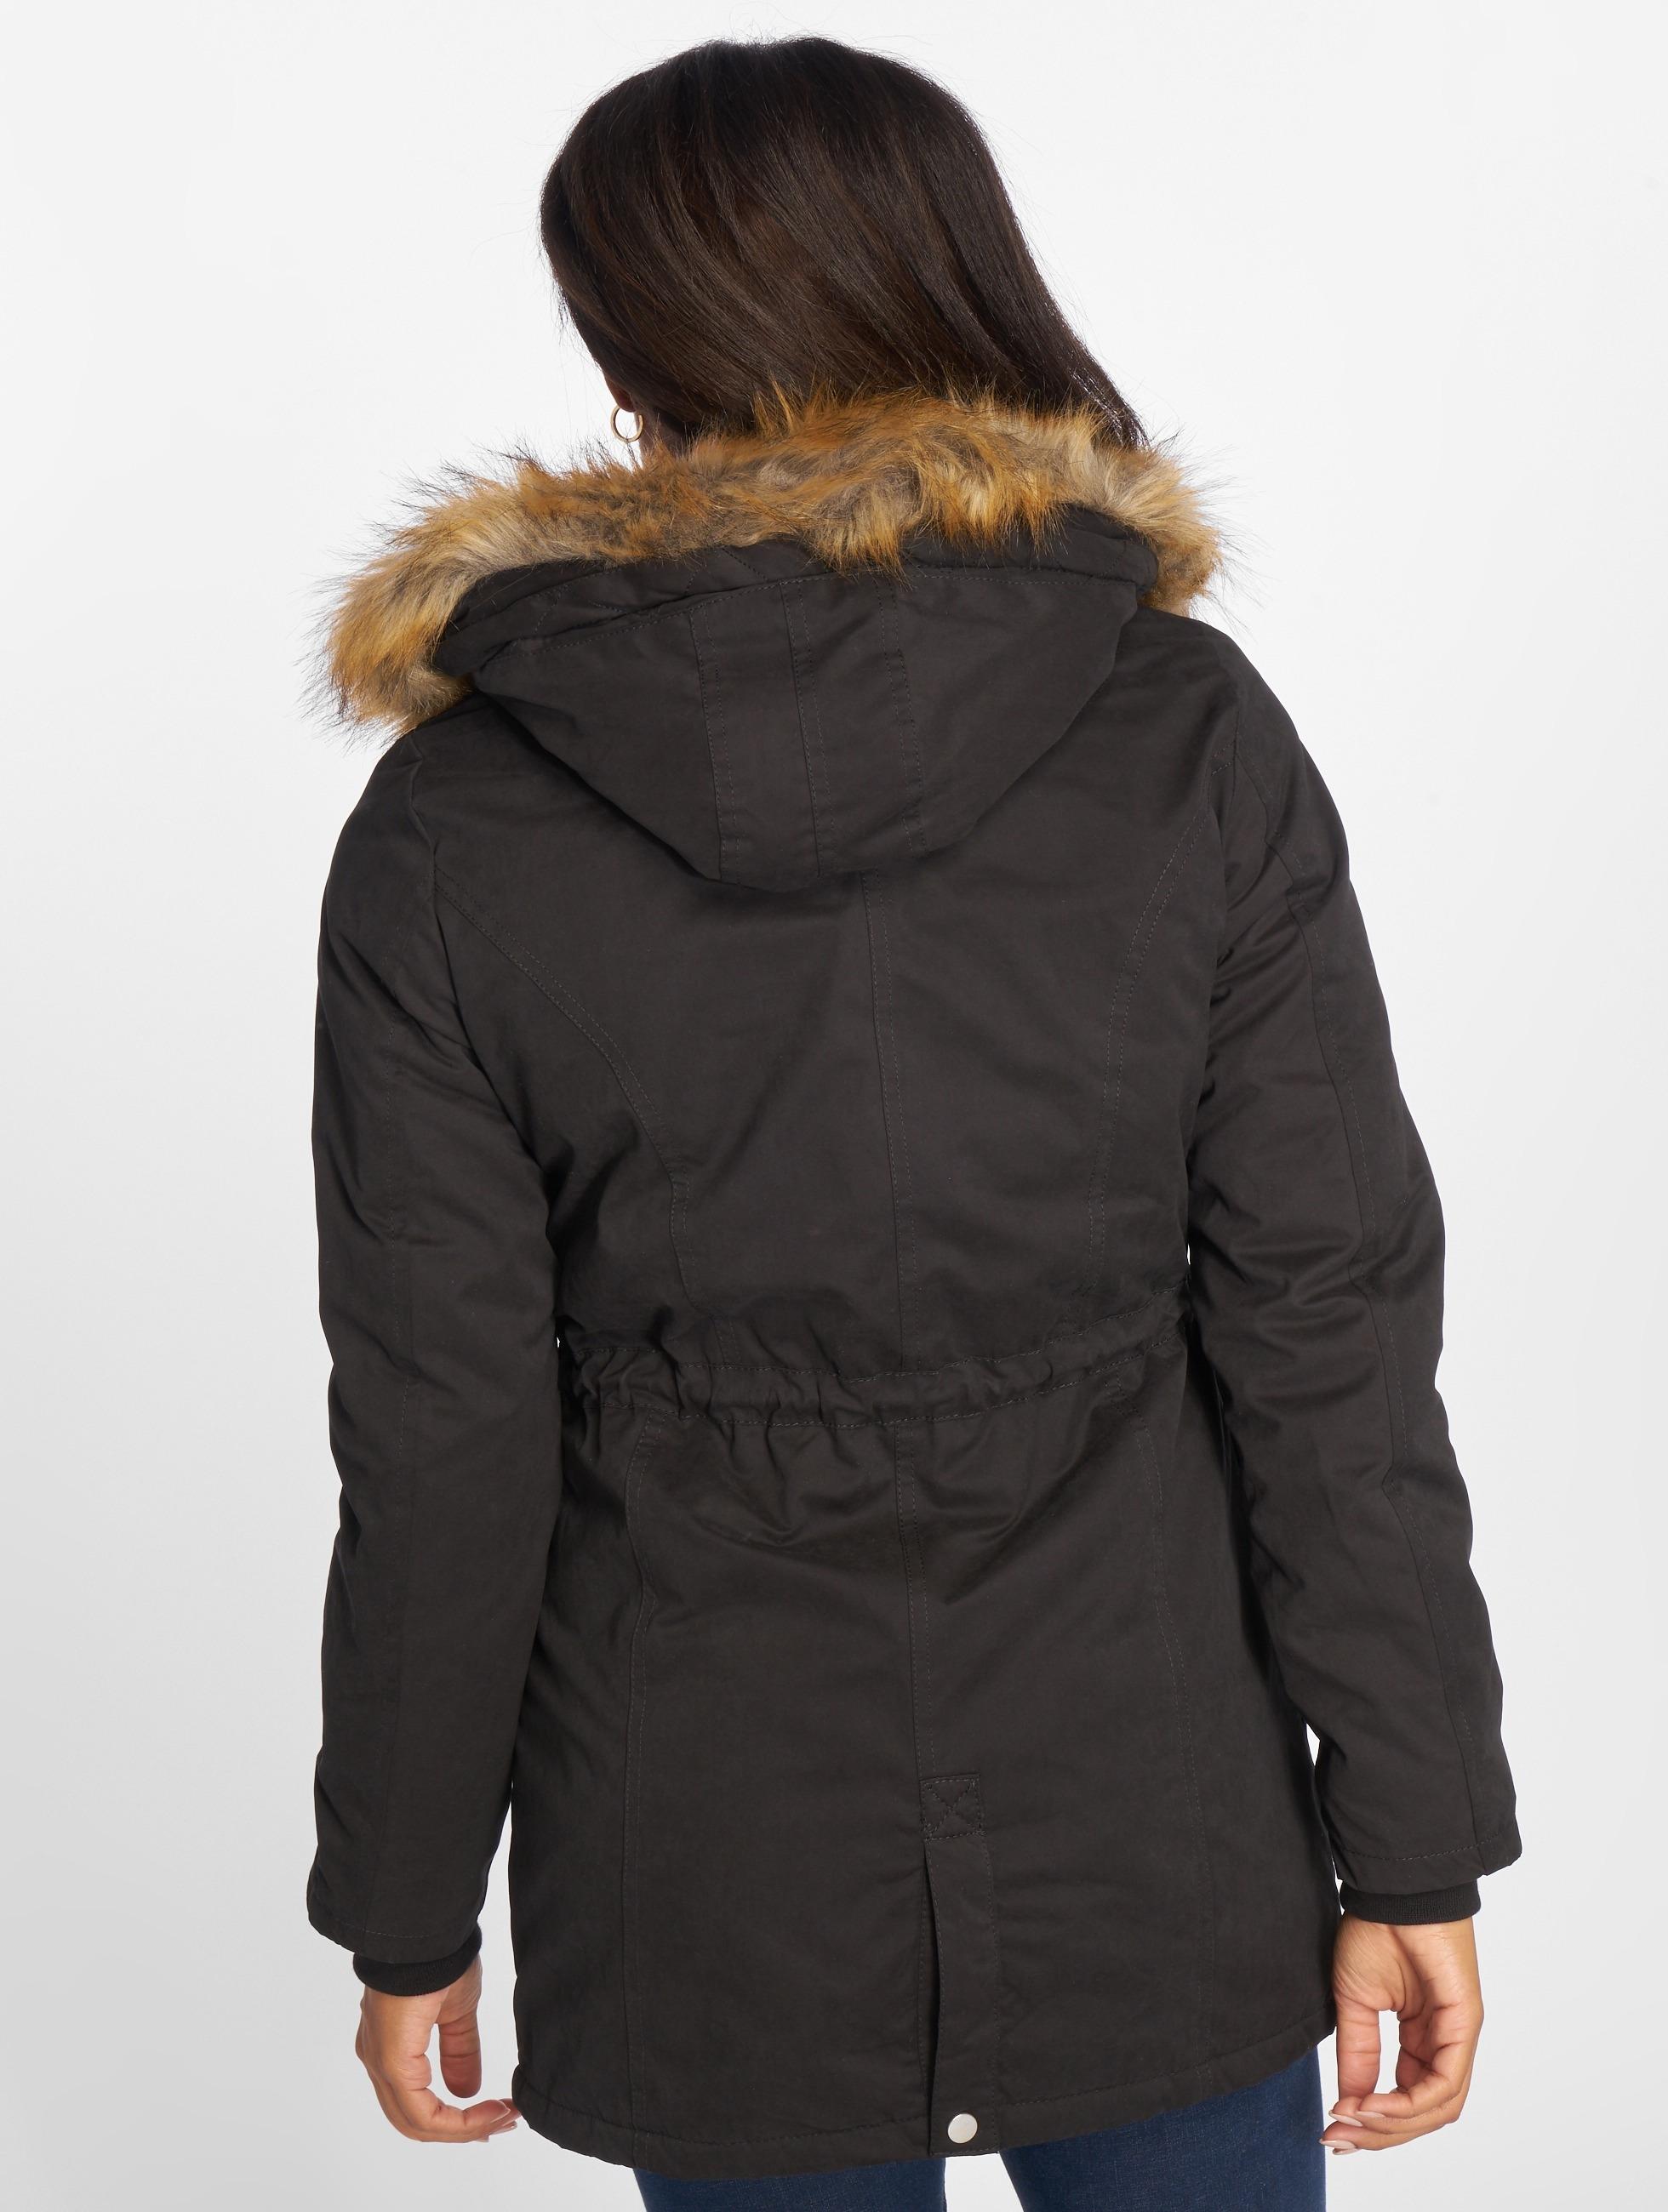 Urban Classics winterjas Ladies Sherpa Lined Peached zwart